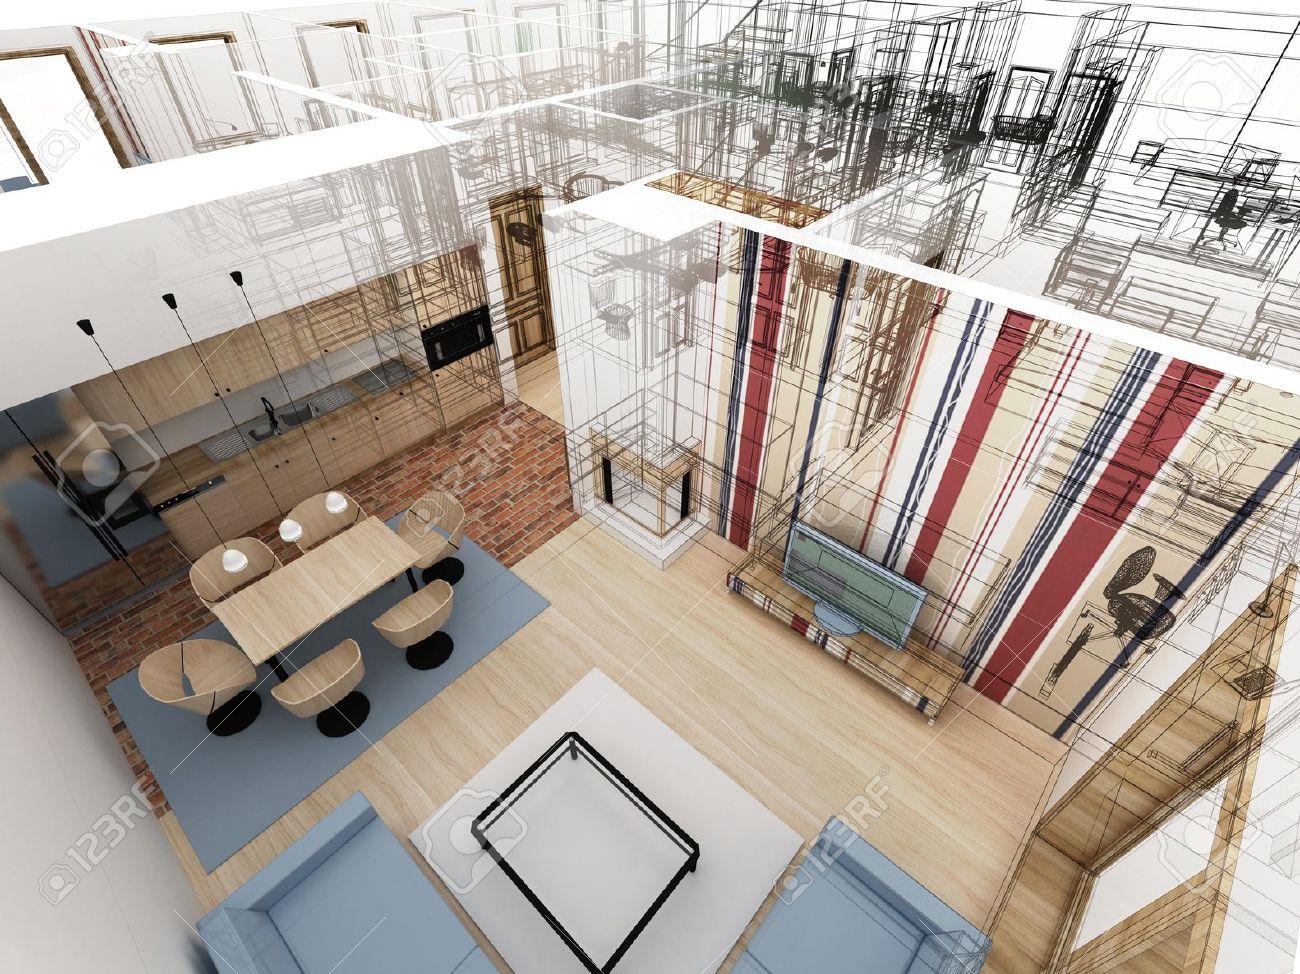 Housing And Interior Design Apartments Level Top View  Interior Design Processstock Photo